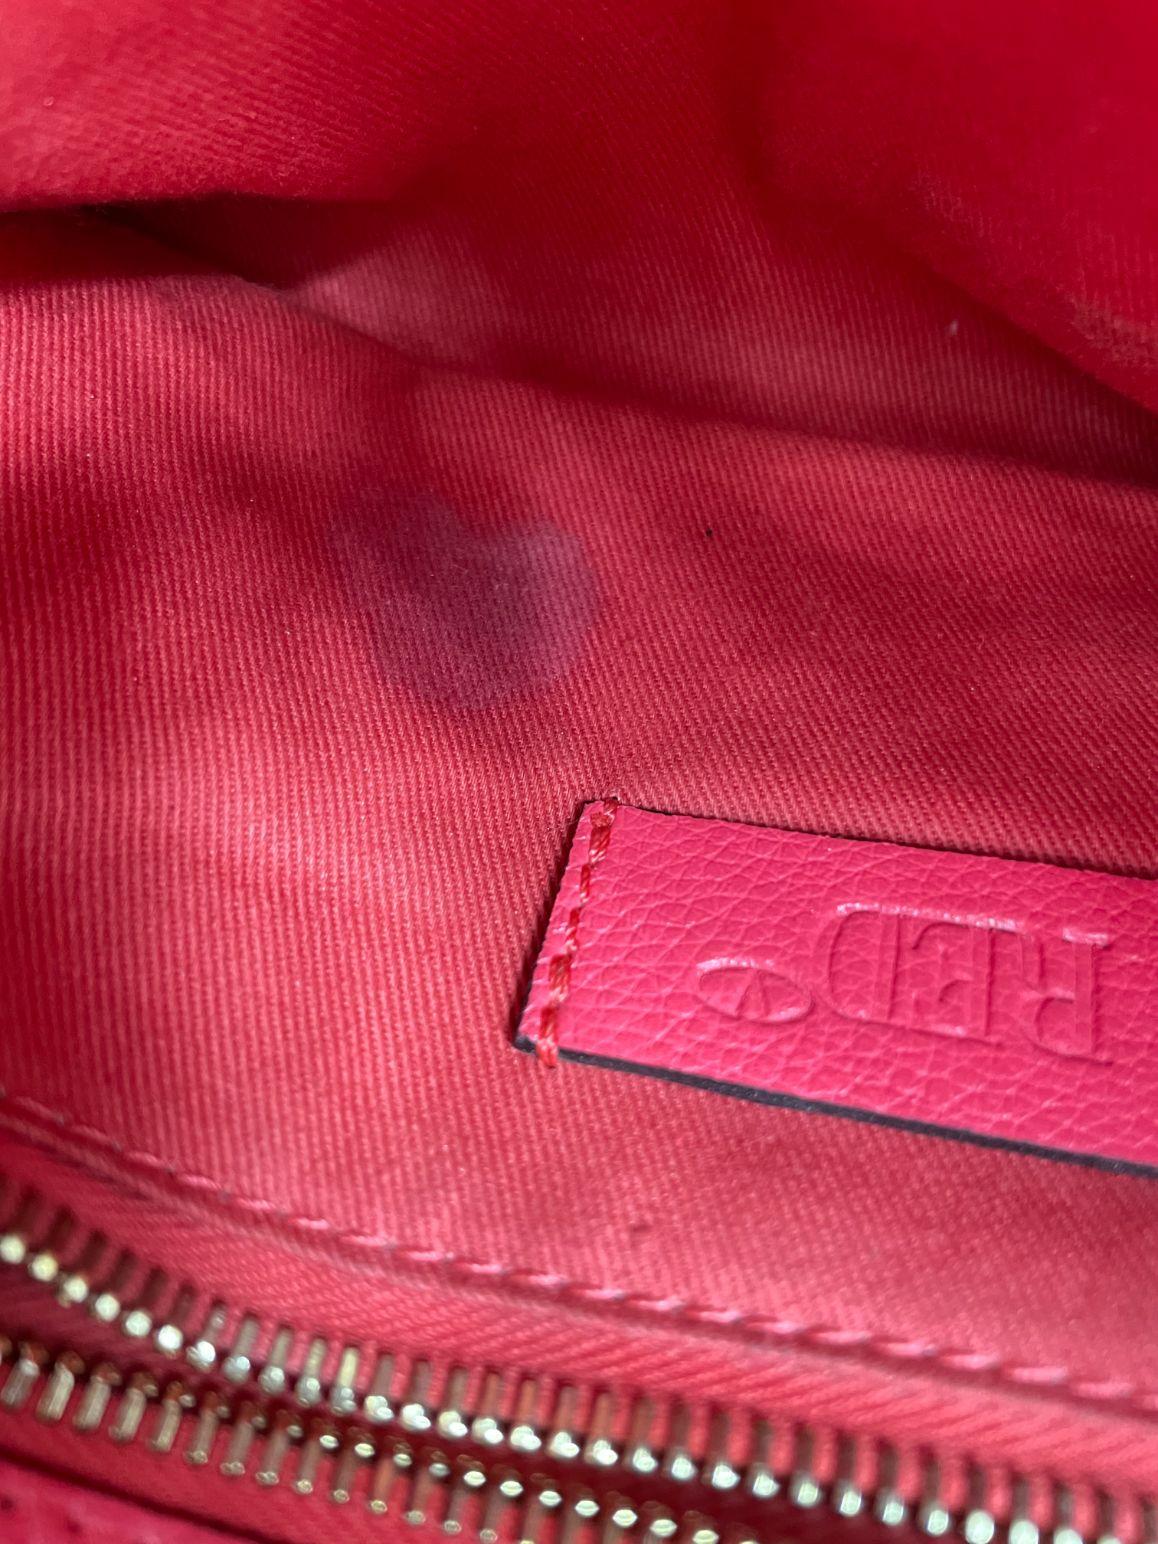 Bolsa Red Valentino